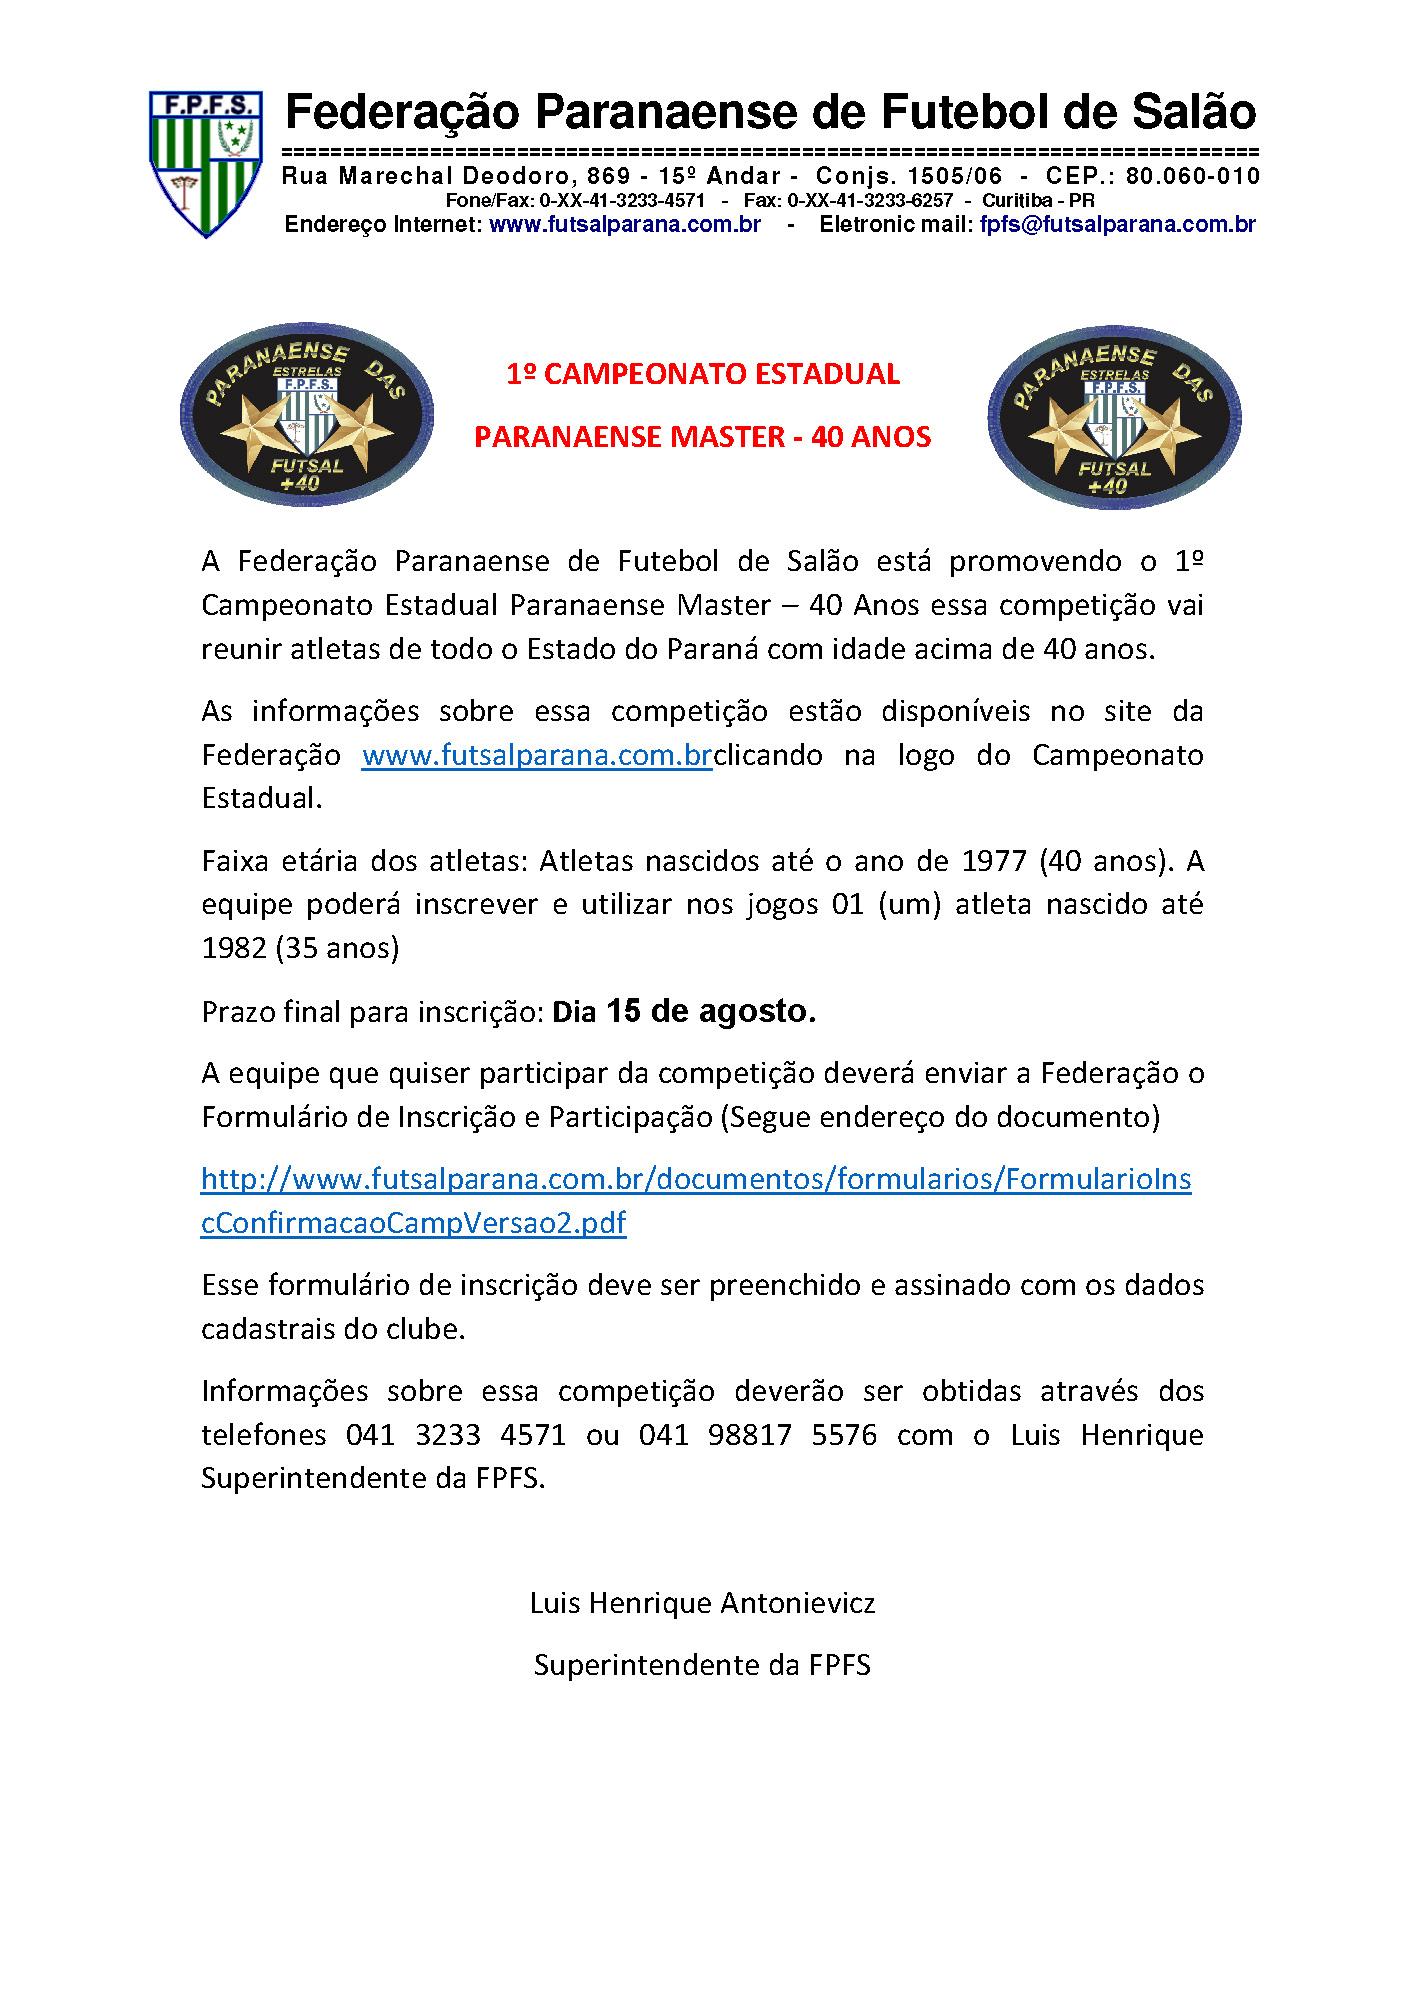 1_CAMPEONATO_ESTADUAL_PARANAENSE_MASTER